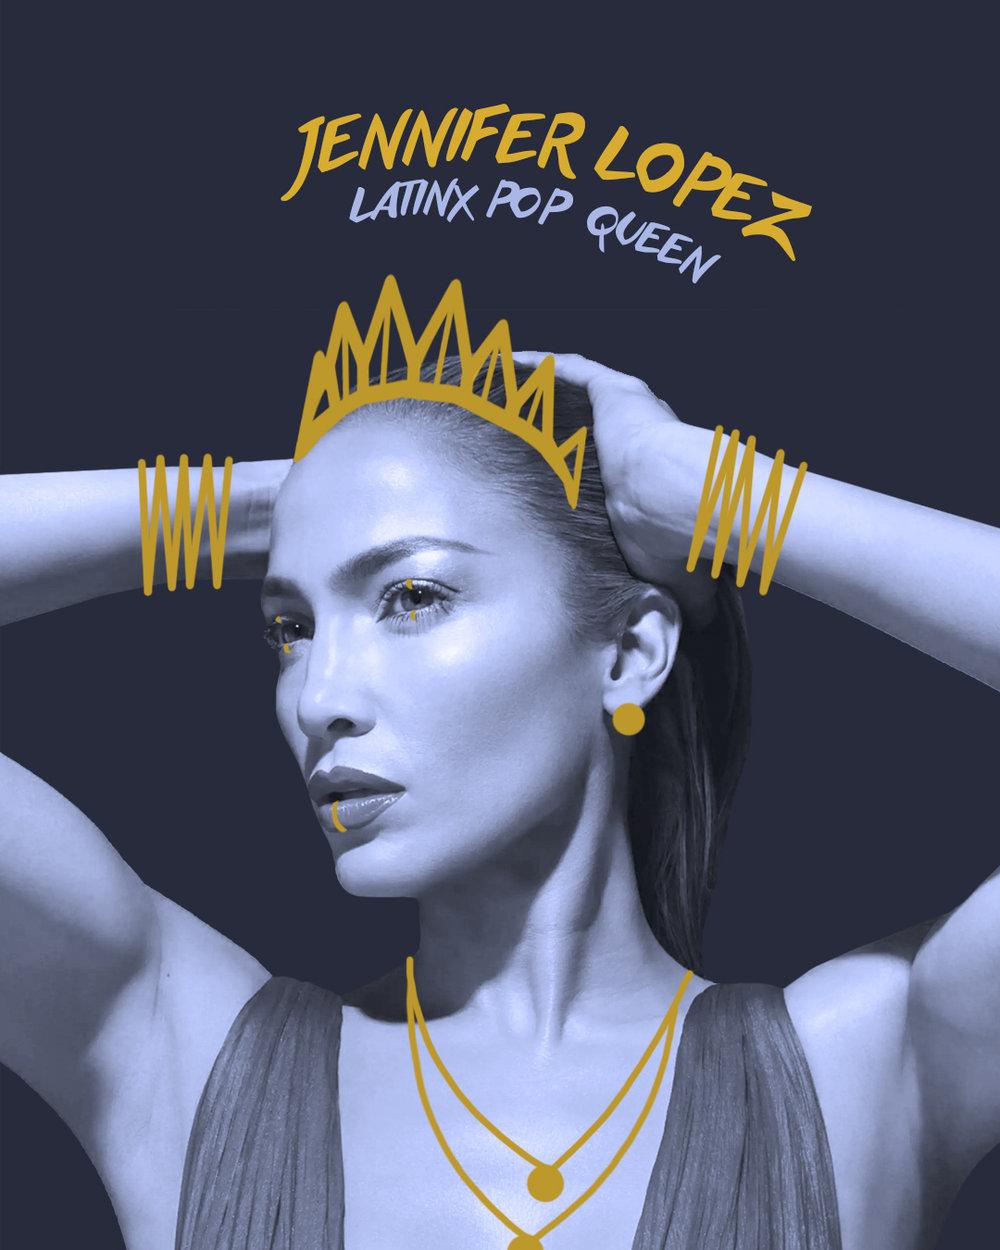 Jennifer_Lopez.jpg